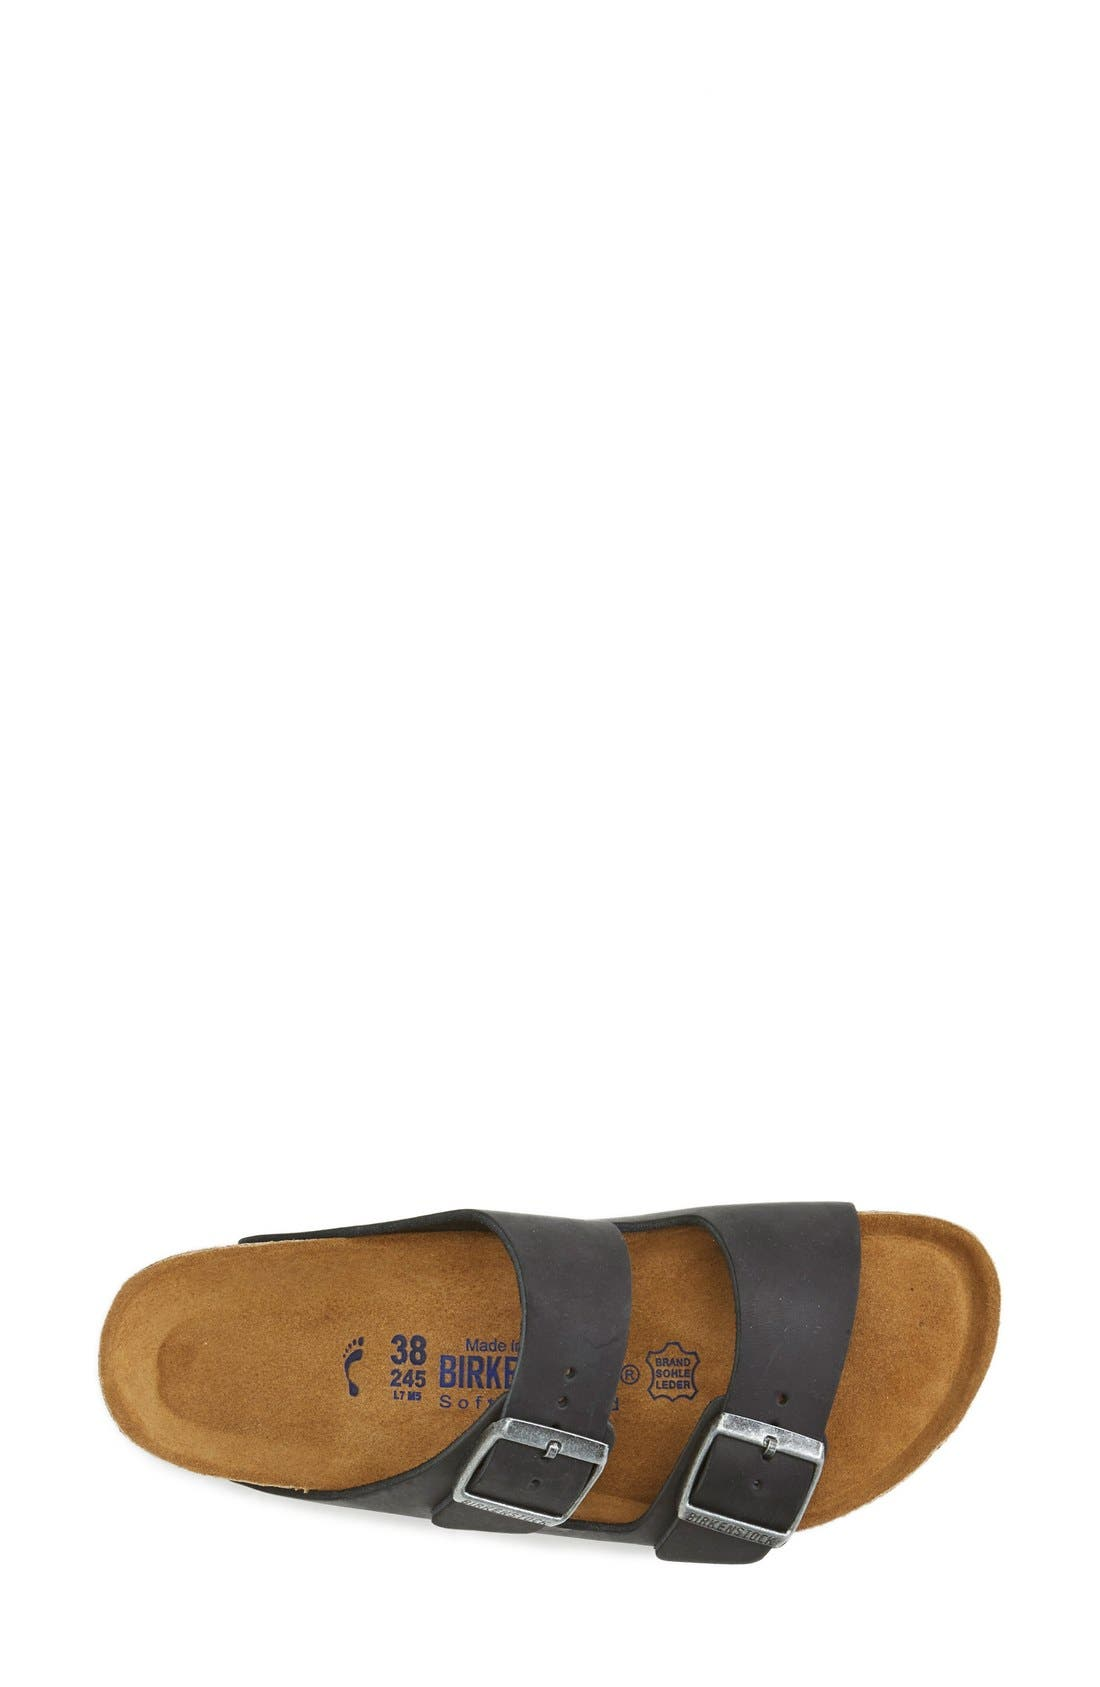 BIRKENSTOCK, Arizona Soft Footbed Sandal, Alternate thumbnail 5, color, BLACK/ BLACK